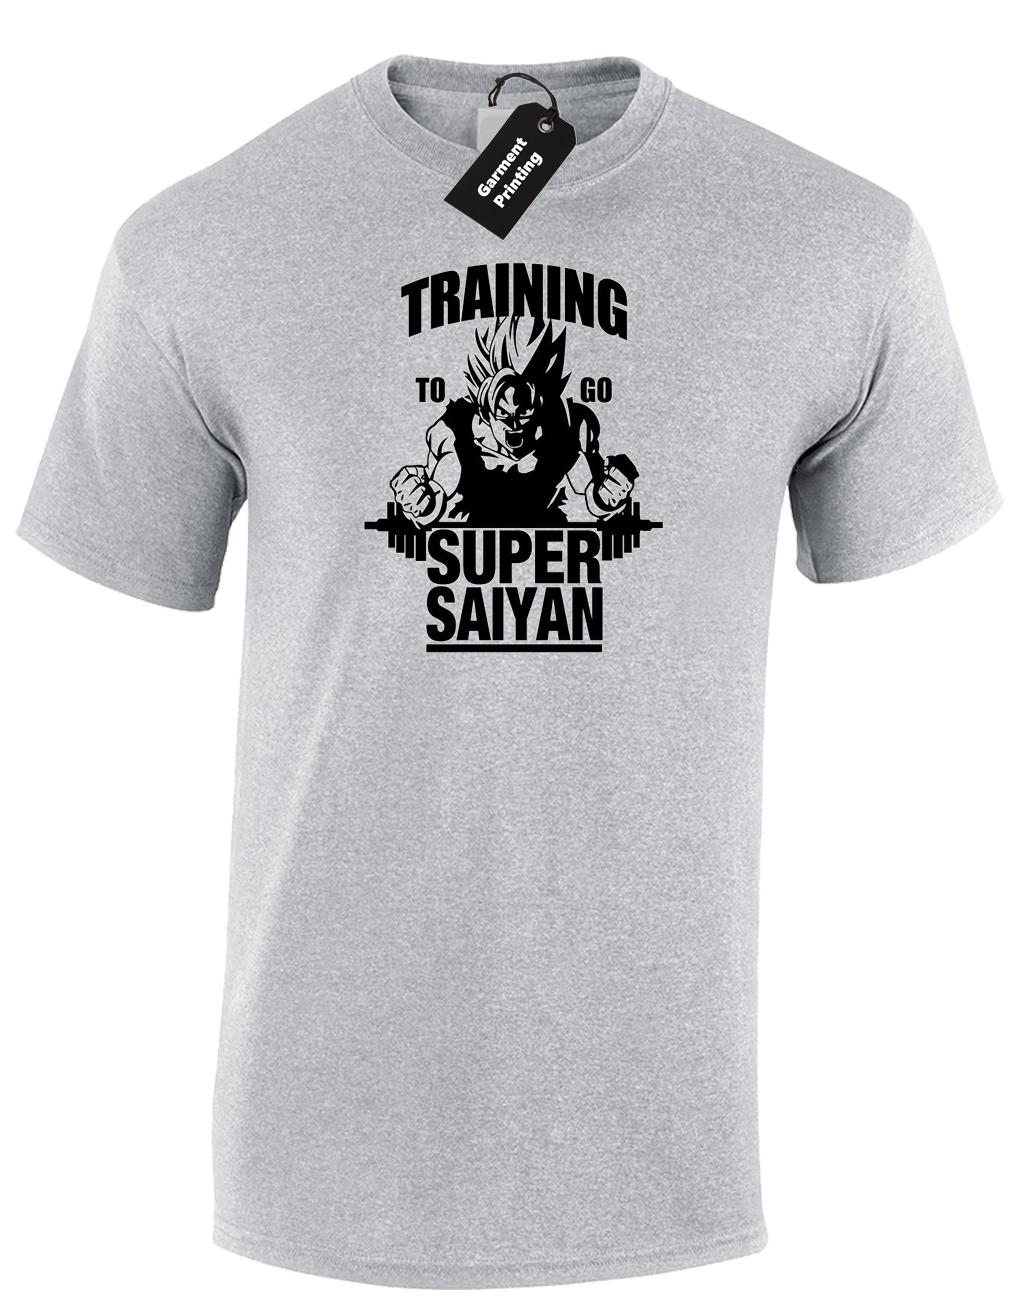 TRAINING SUPER SAIYAN MENS T-SHIRT CLASSIC DRAGONBALL ANIME CARTOON Z TOP